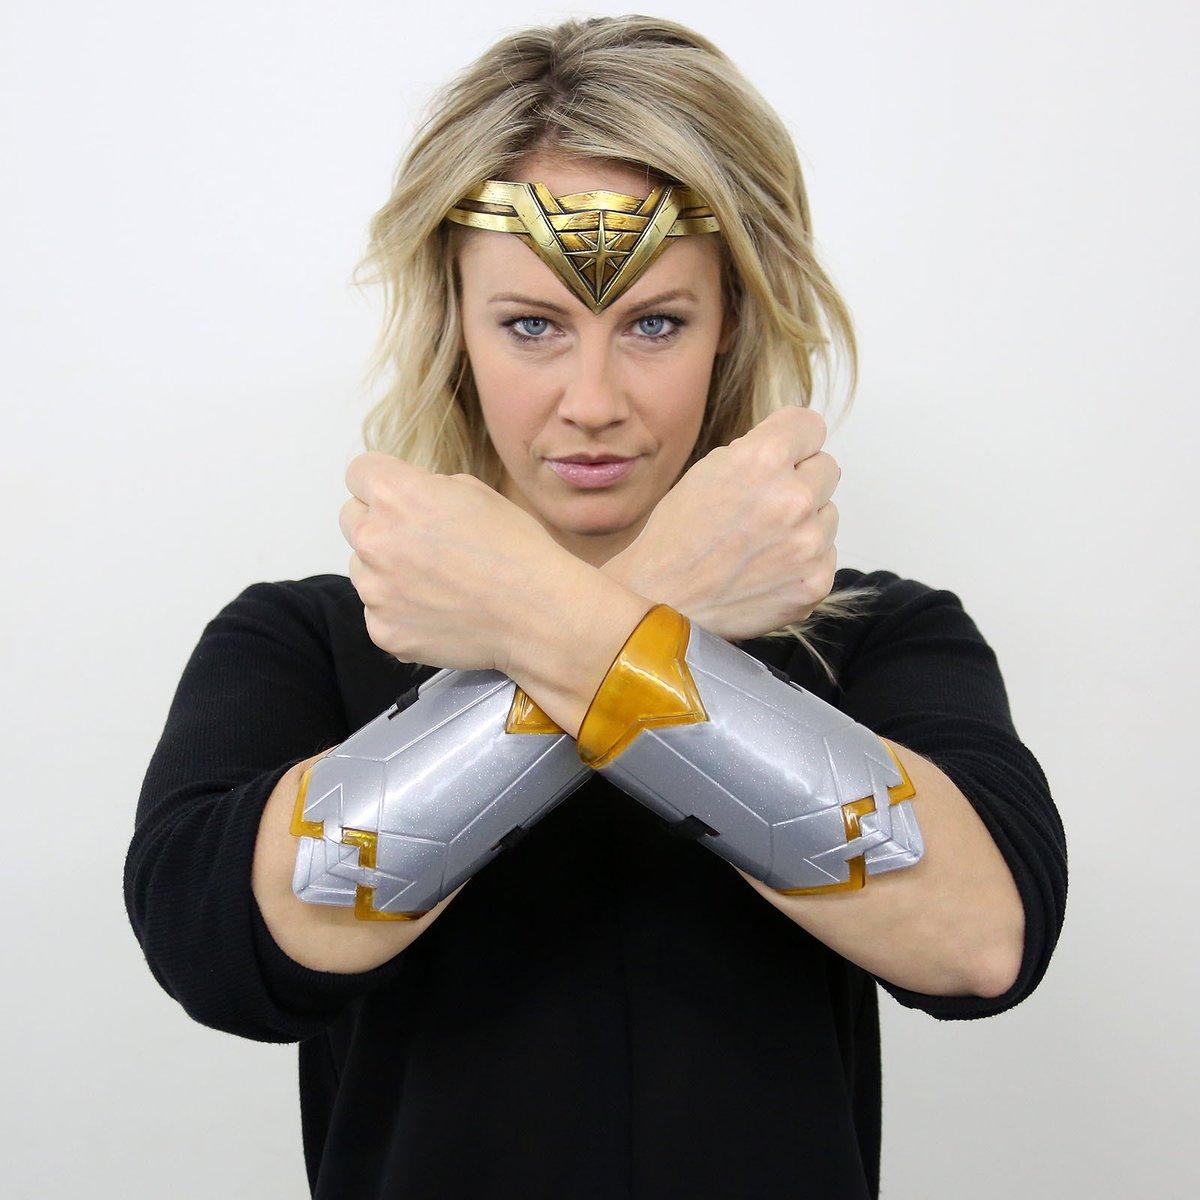 Natasha Staniszewski On Twitter I Have A Feeling She S Going To Be Way Fiercer Than I Am Celebrating Wonderwoman In Theatres Today Wwofbellmedia Sponsoredbywarnerbros Https T Co S39gmhvmgf